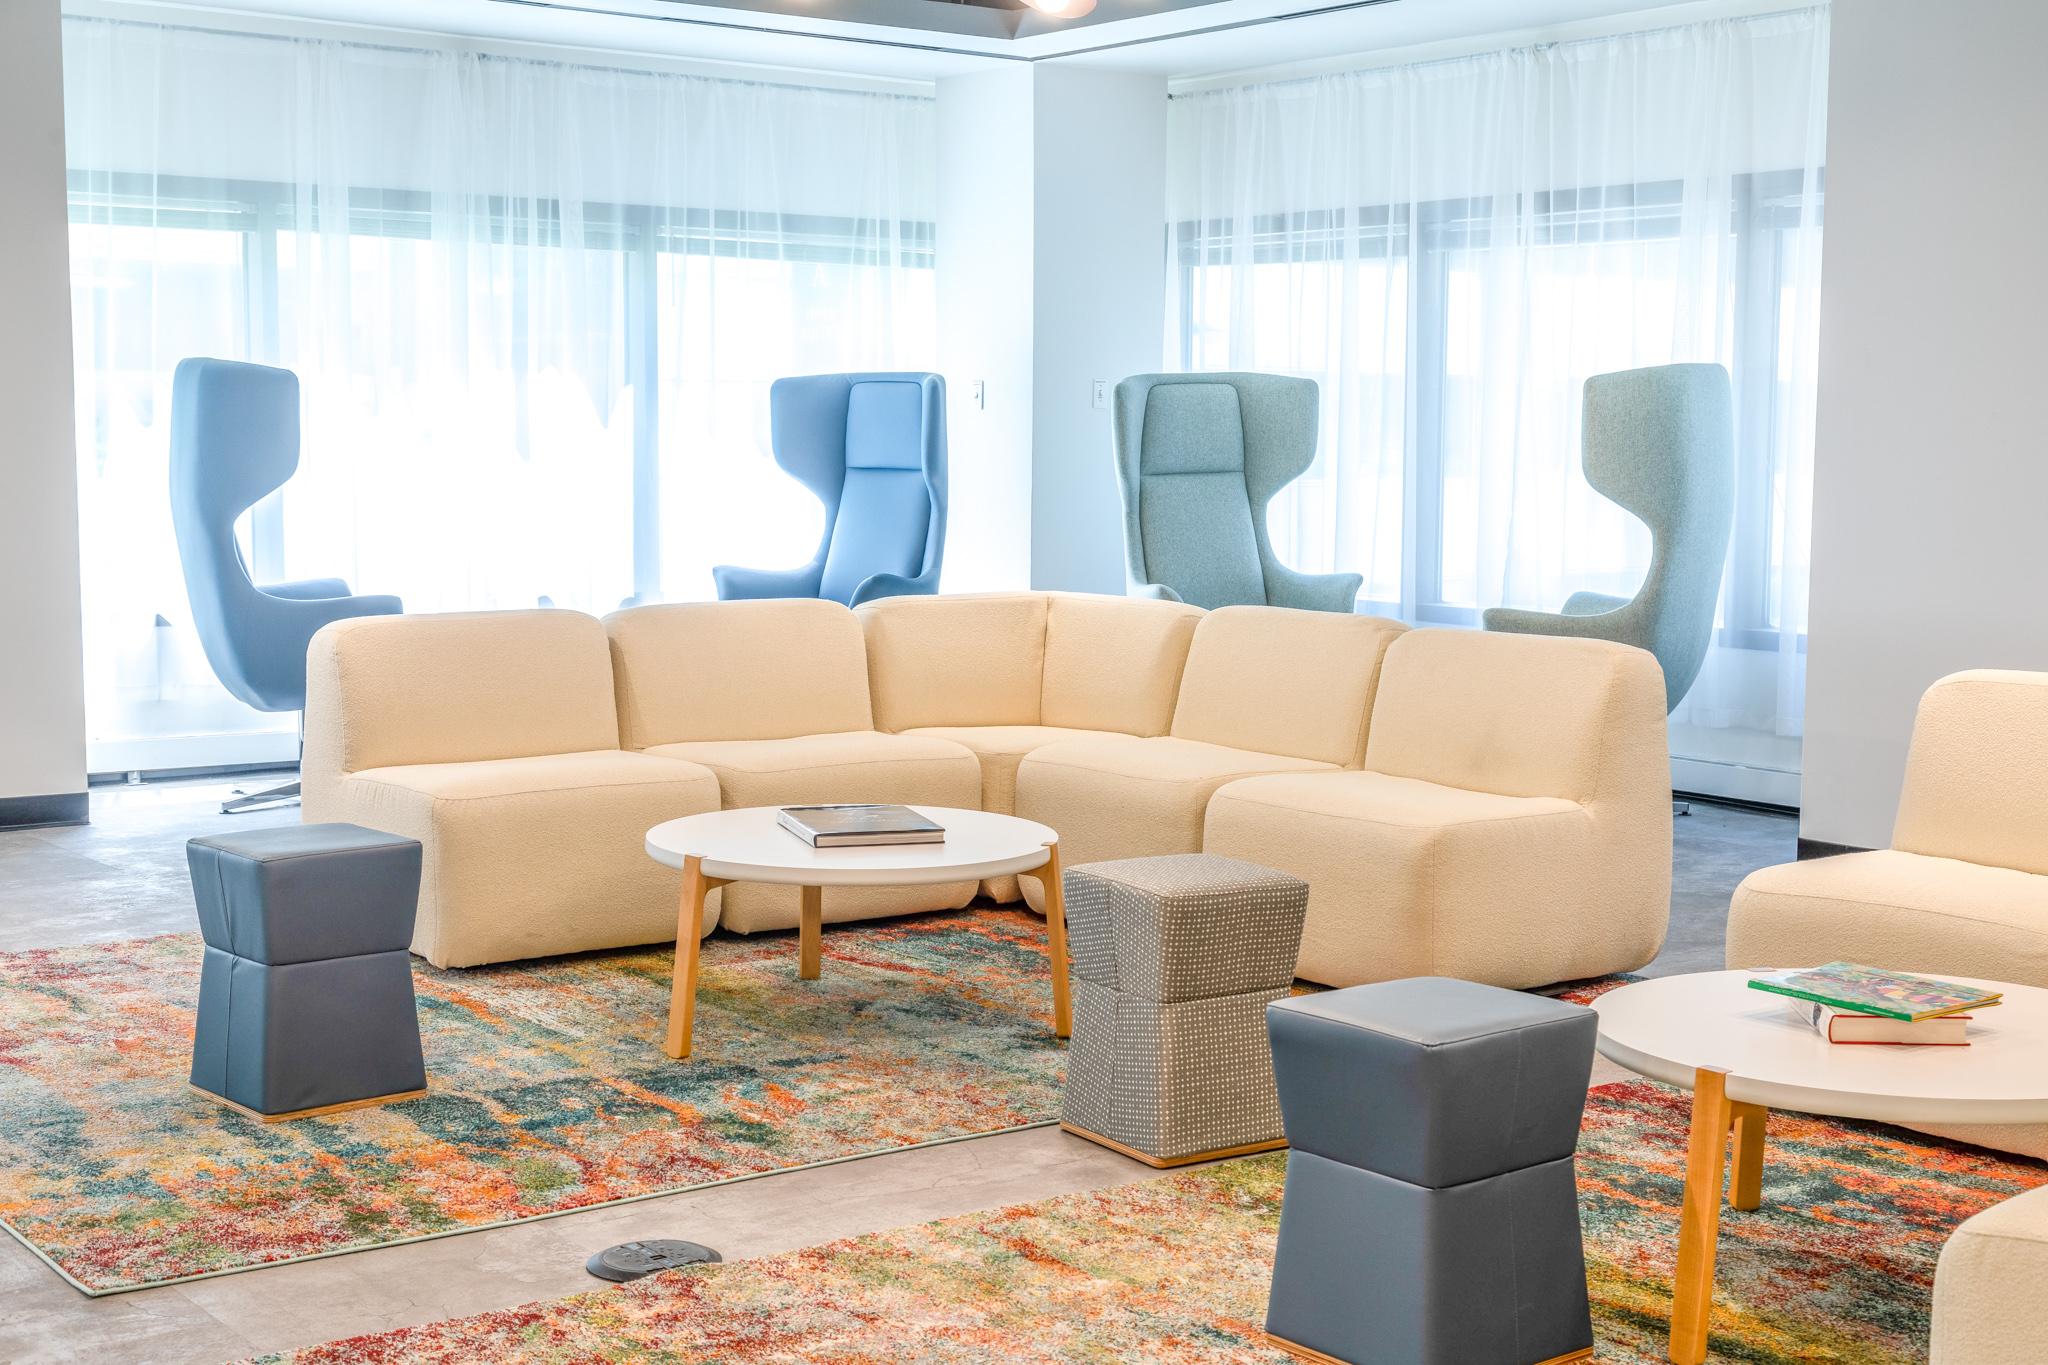 chicago-office-furniture-lounge-ottoman-cream